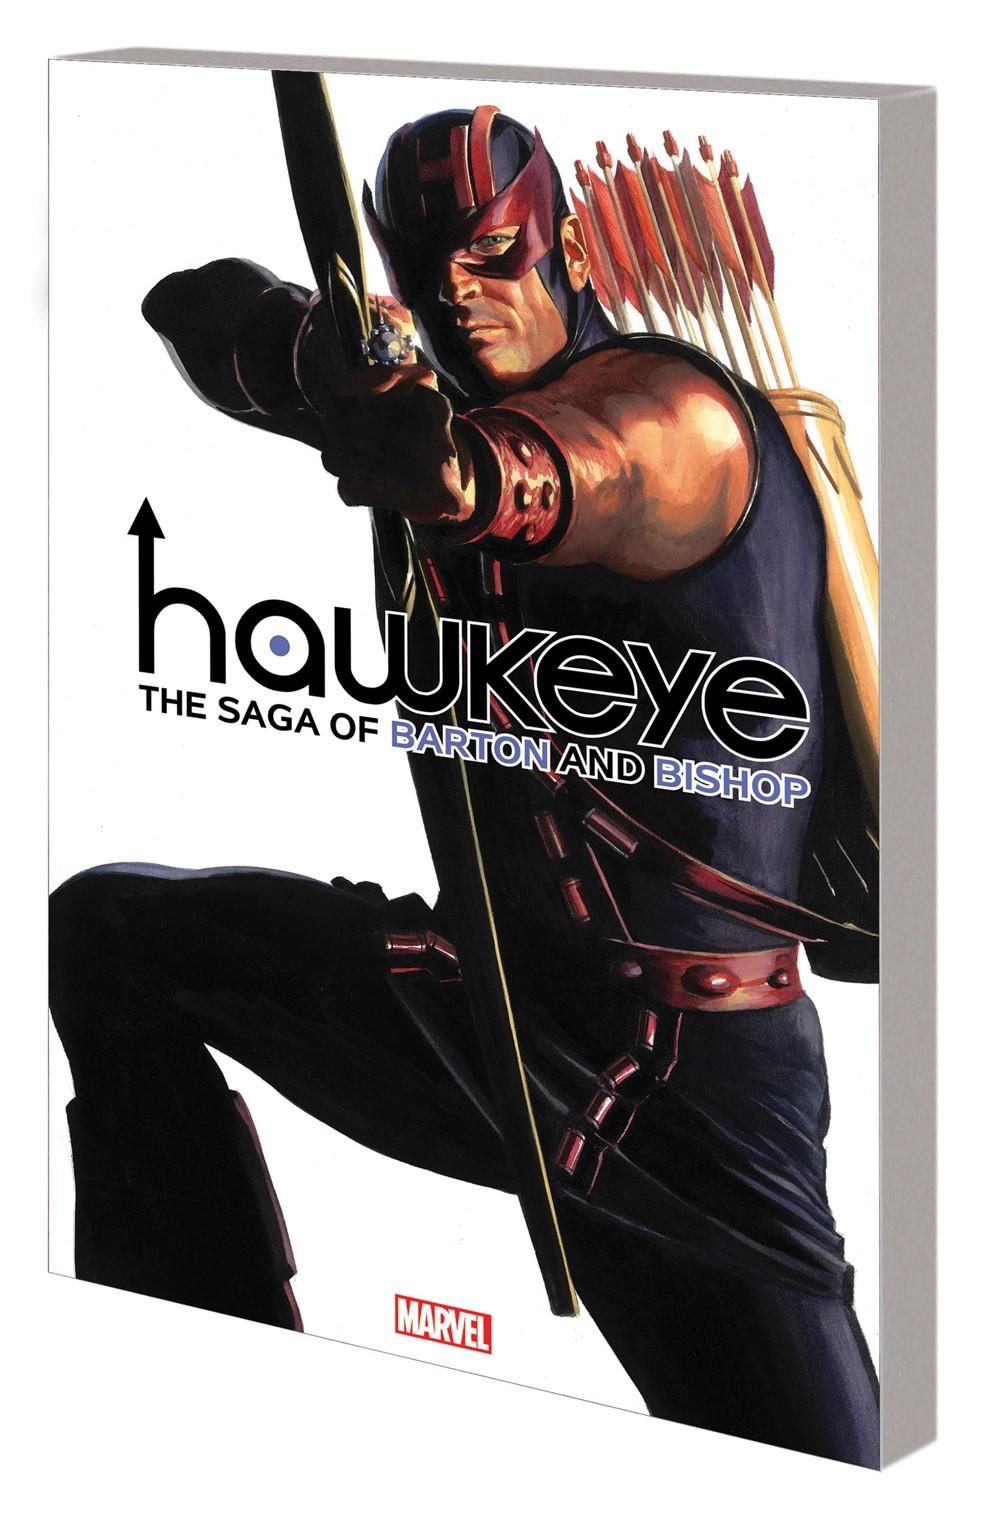 HAWKEYEFASAGA_TPB Marvel Comics September 2021 Solicitations